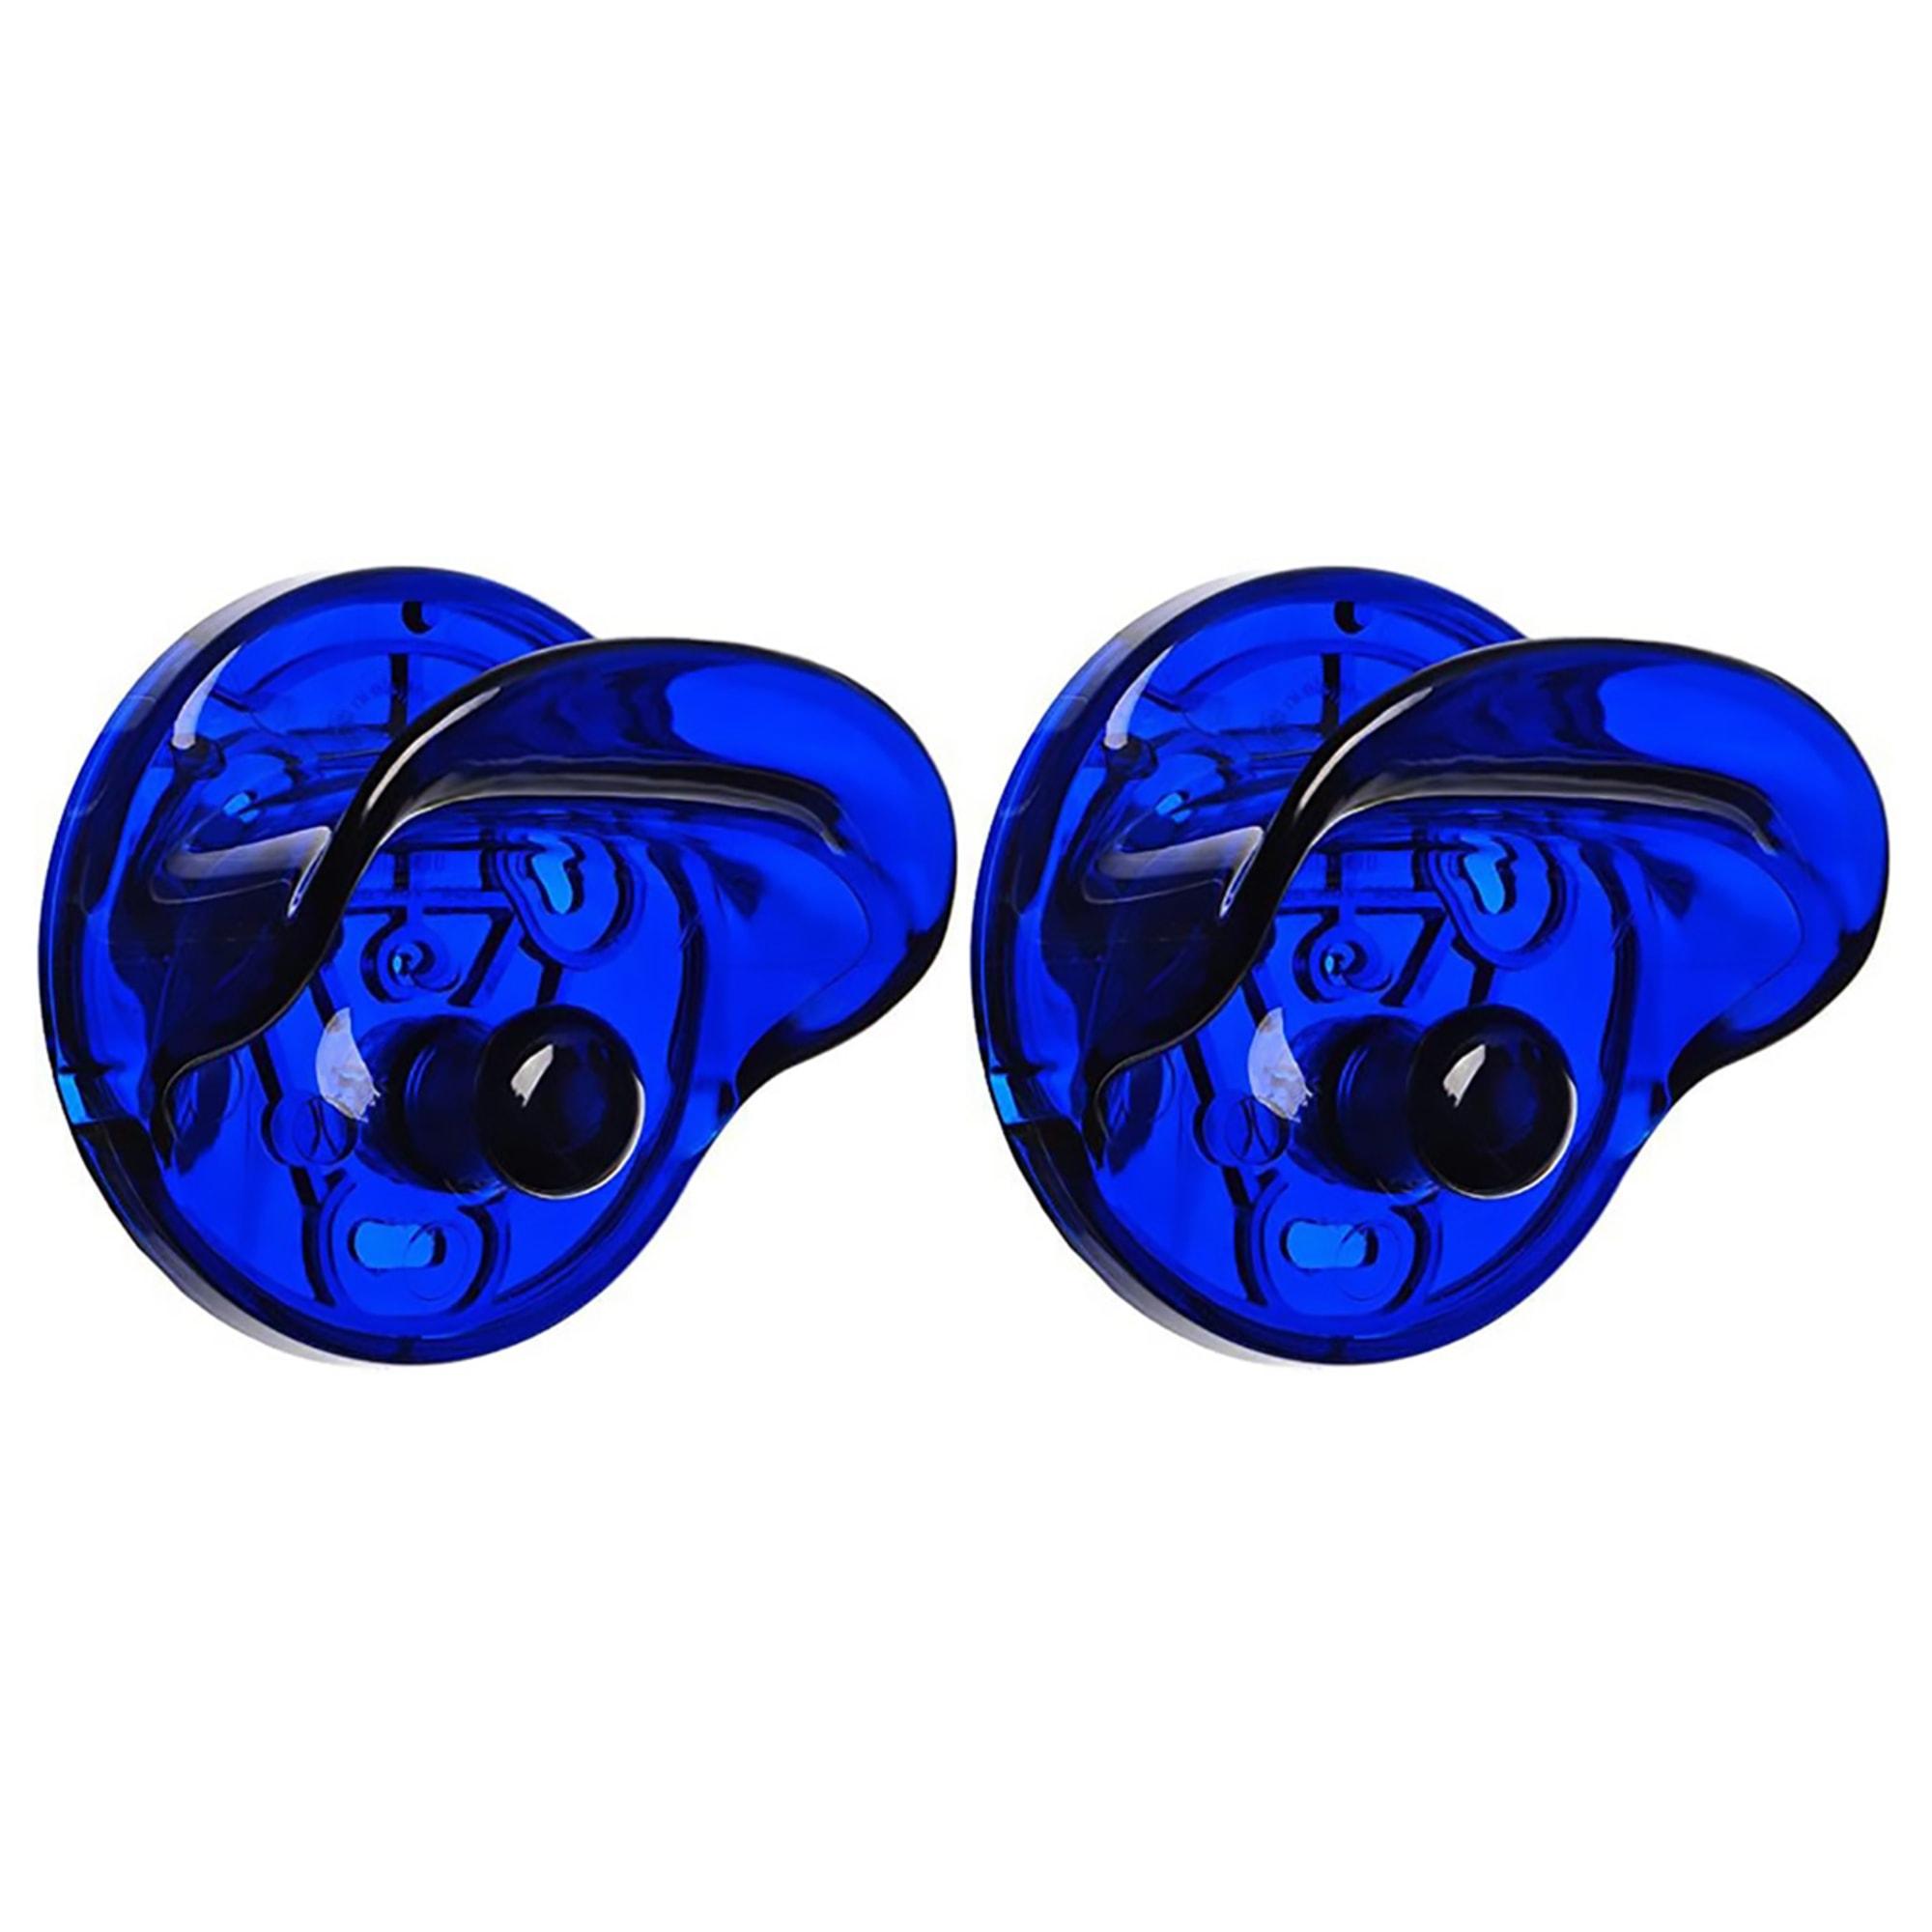 Etole KARTELL Bleu, bleu marine, bleu turquoise